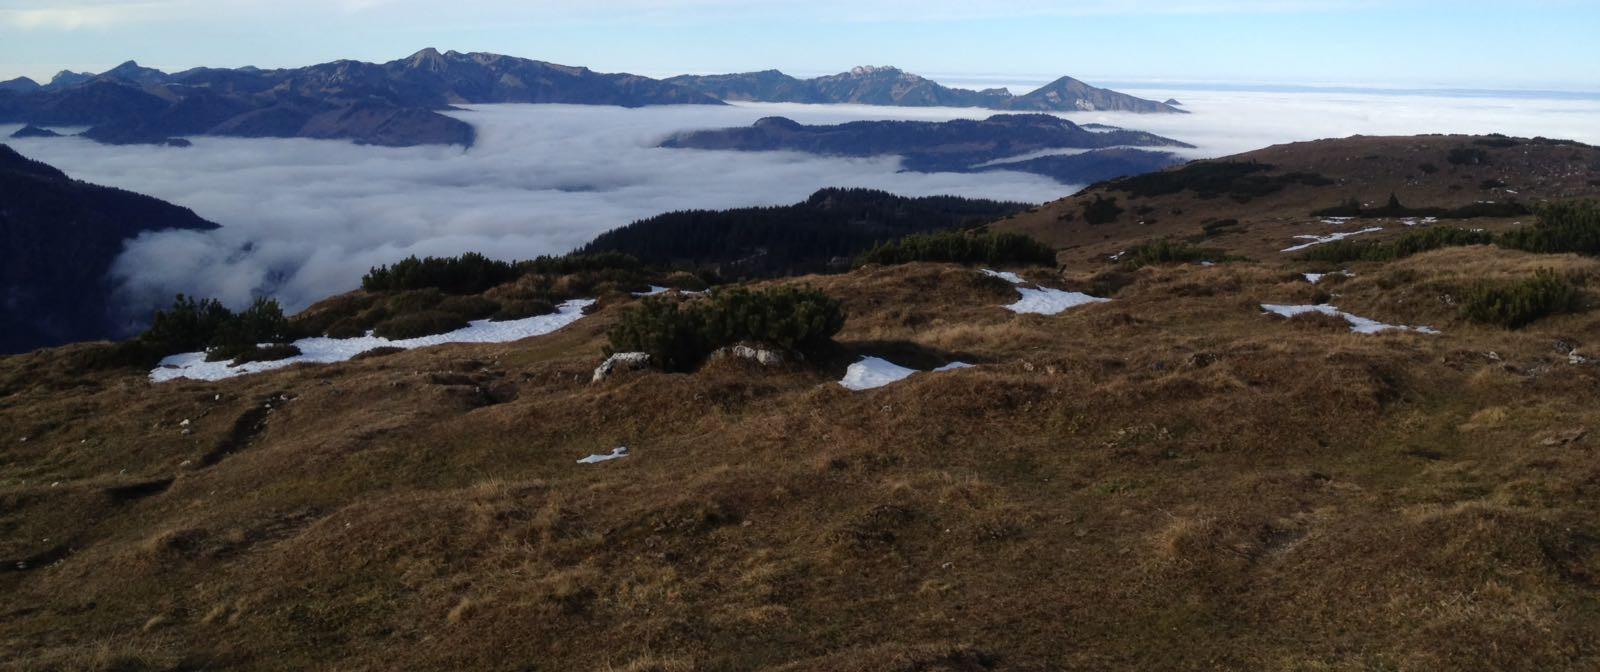 Kampenwandimpressionen bei Nebel